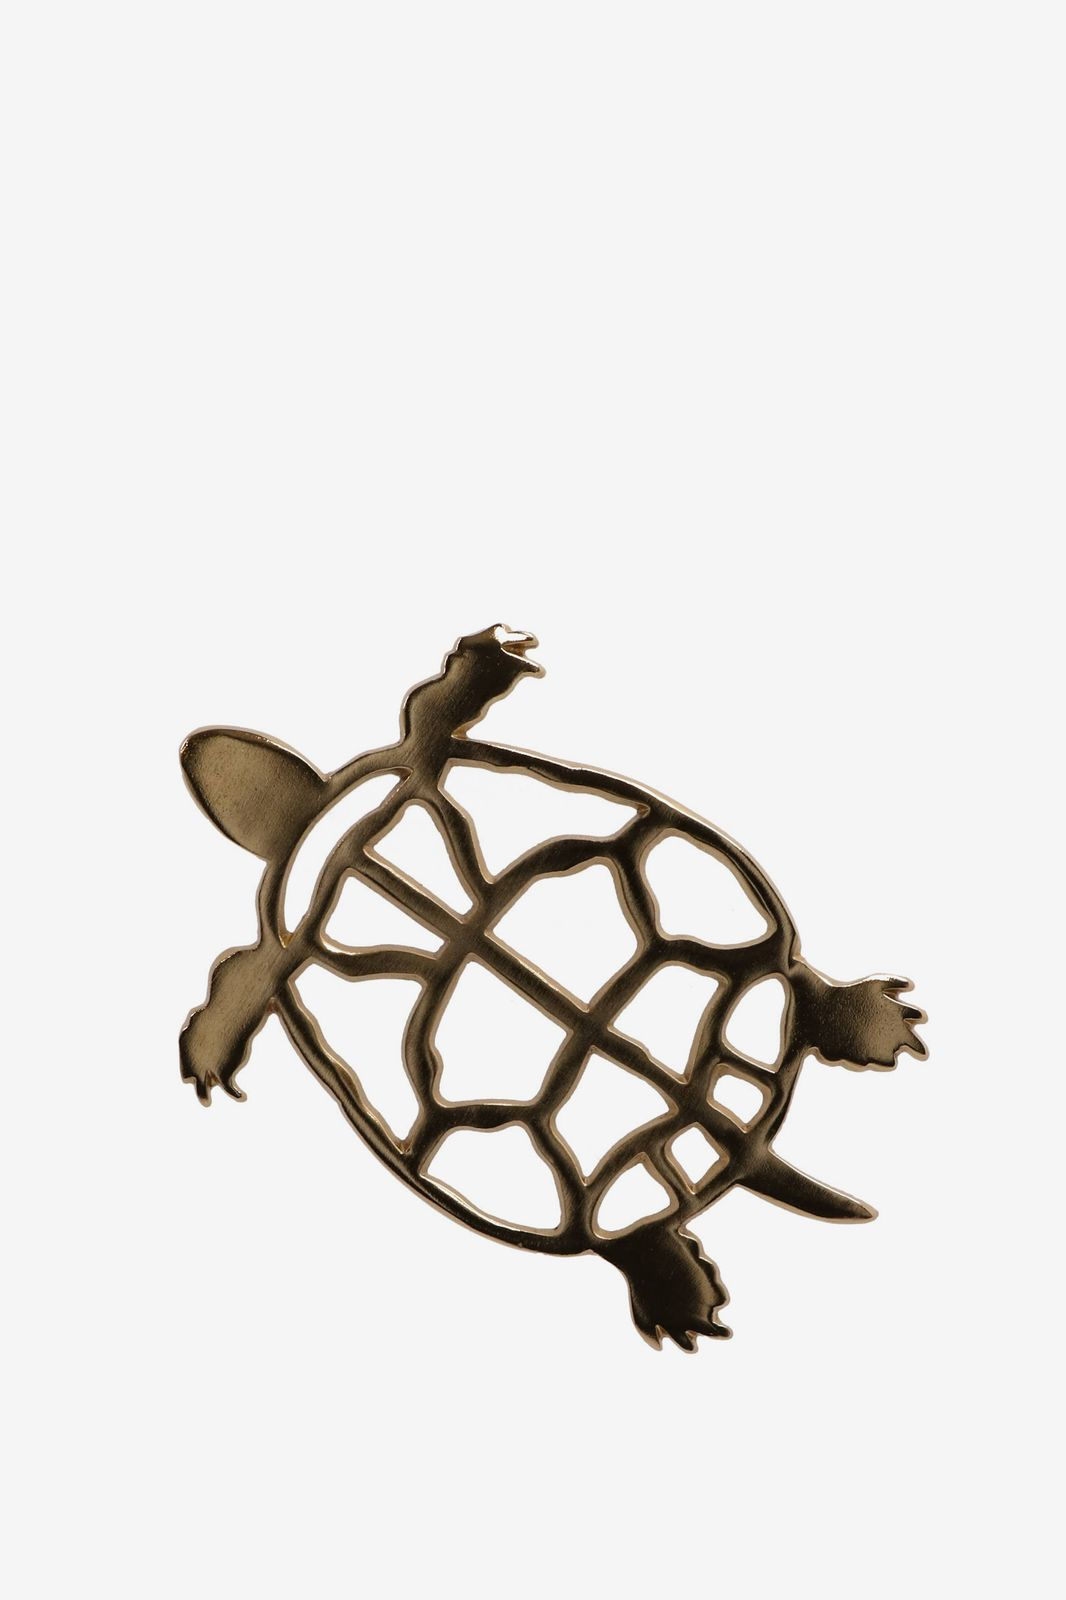 Messing onderzetter schildpad